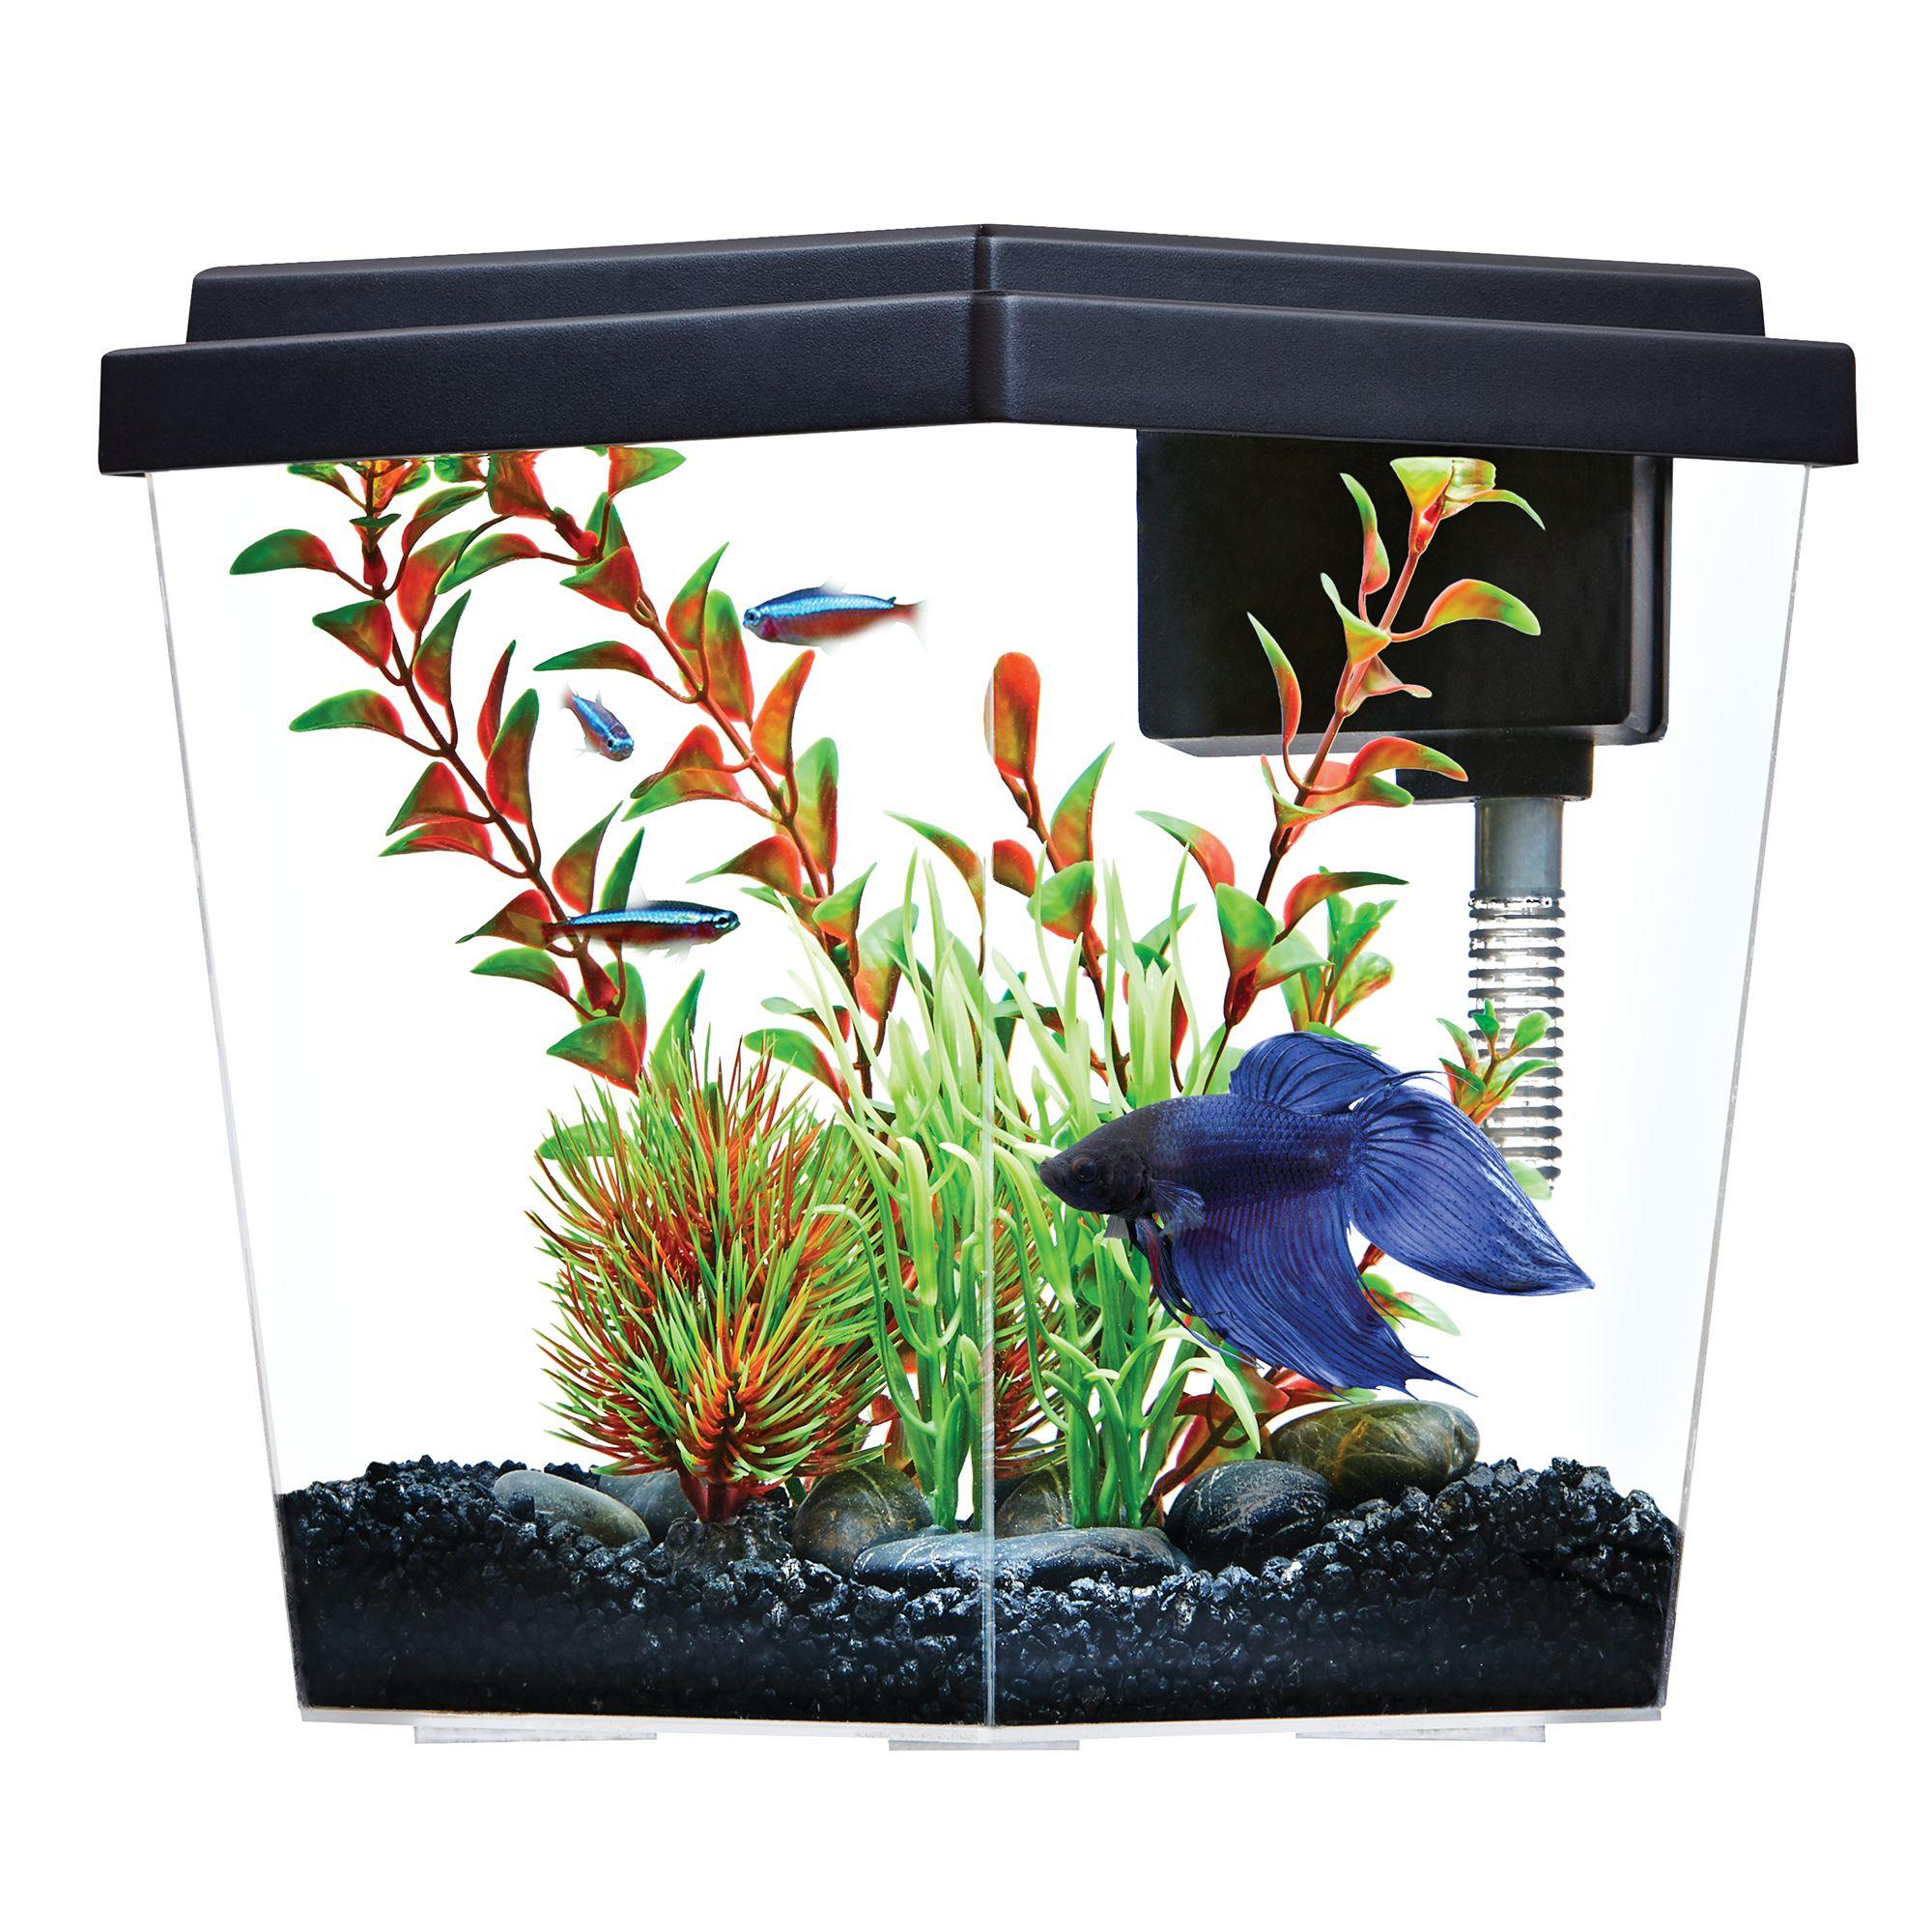 Top Fin Excite Aquarium 1 Gallon Fish Starter Kits Petsmart